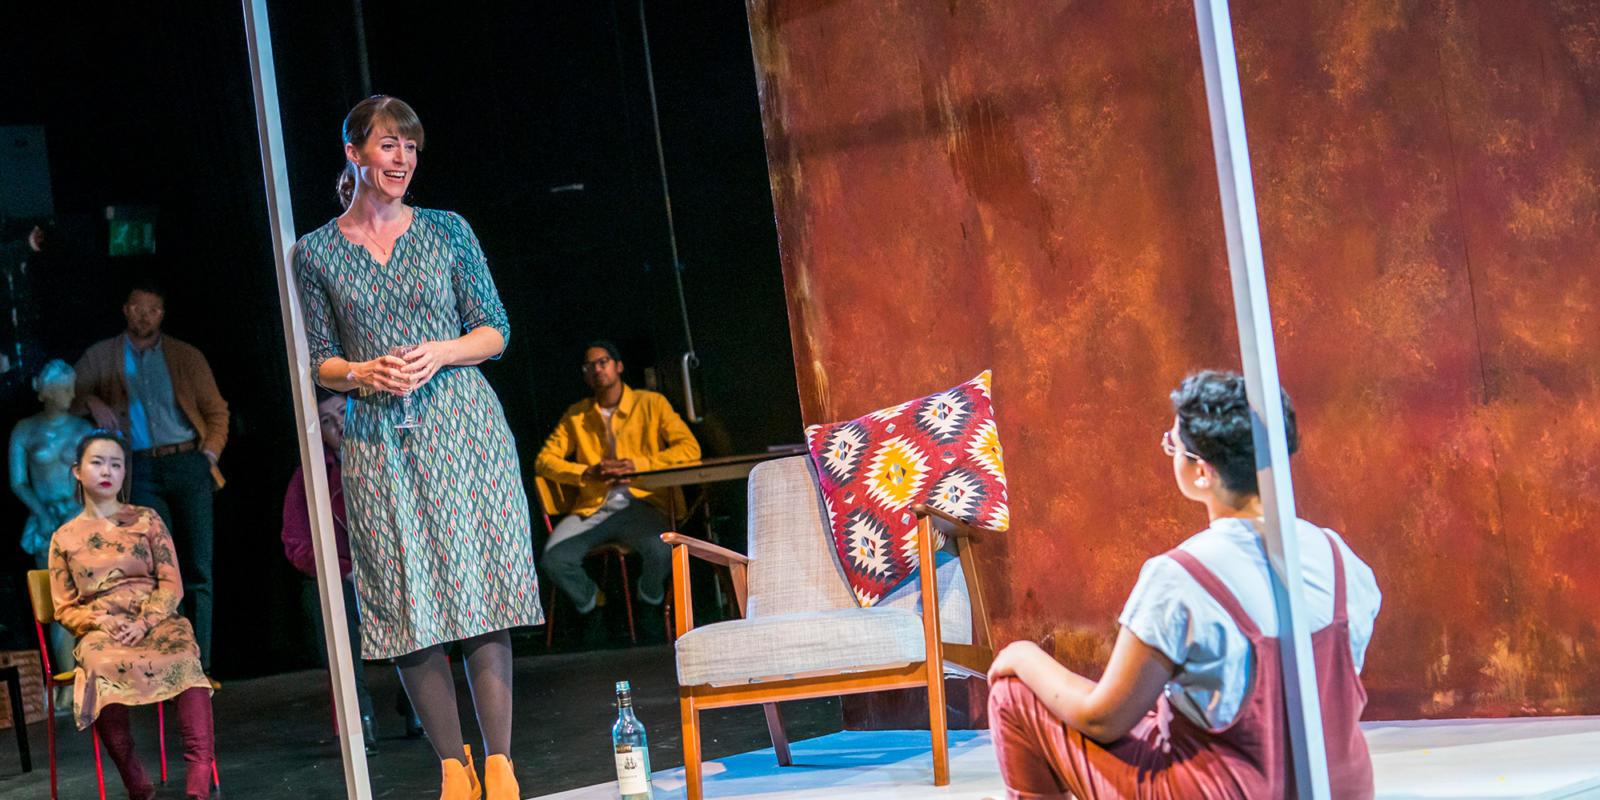 Rachael Lloyd, Eyra Norman and chorus in Dido at the Unicorn Theatre. Photo Tristram Kenton